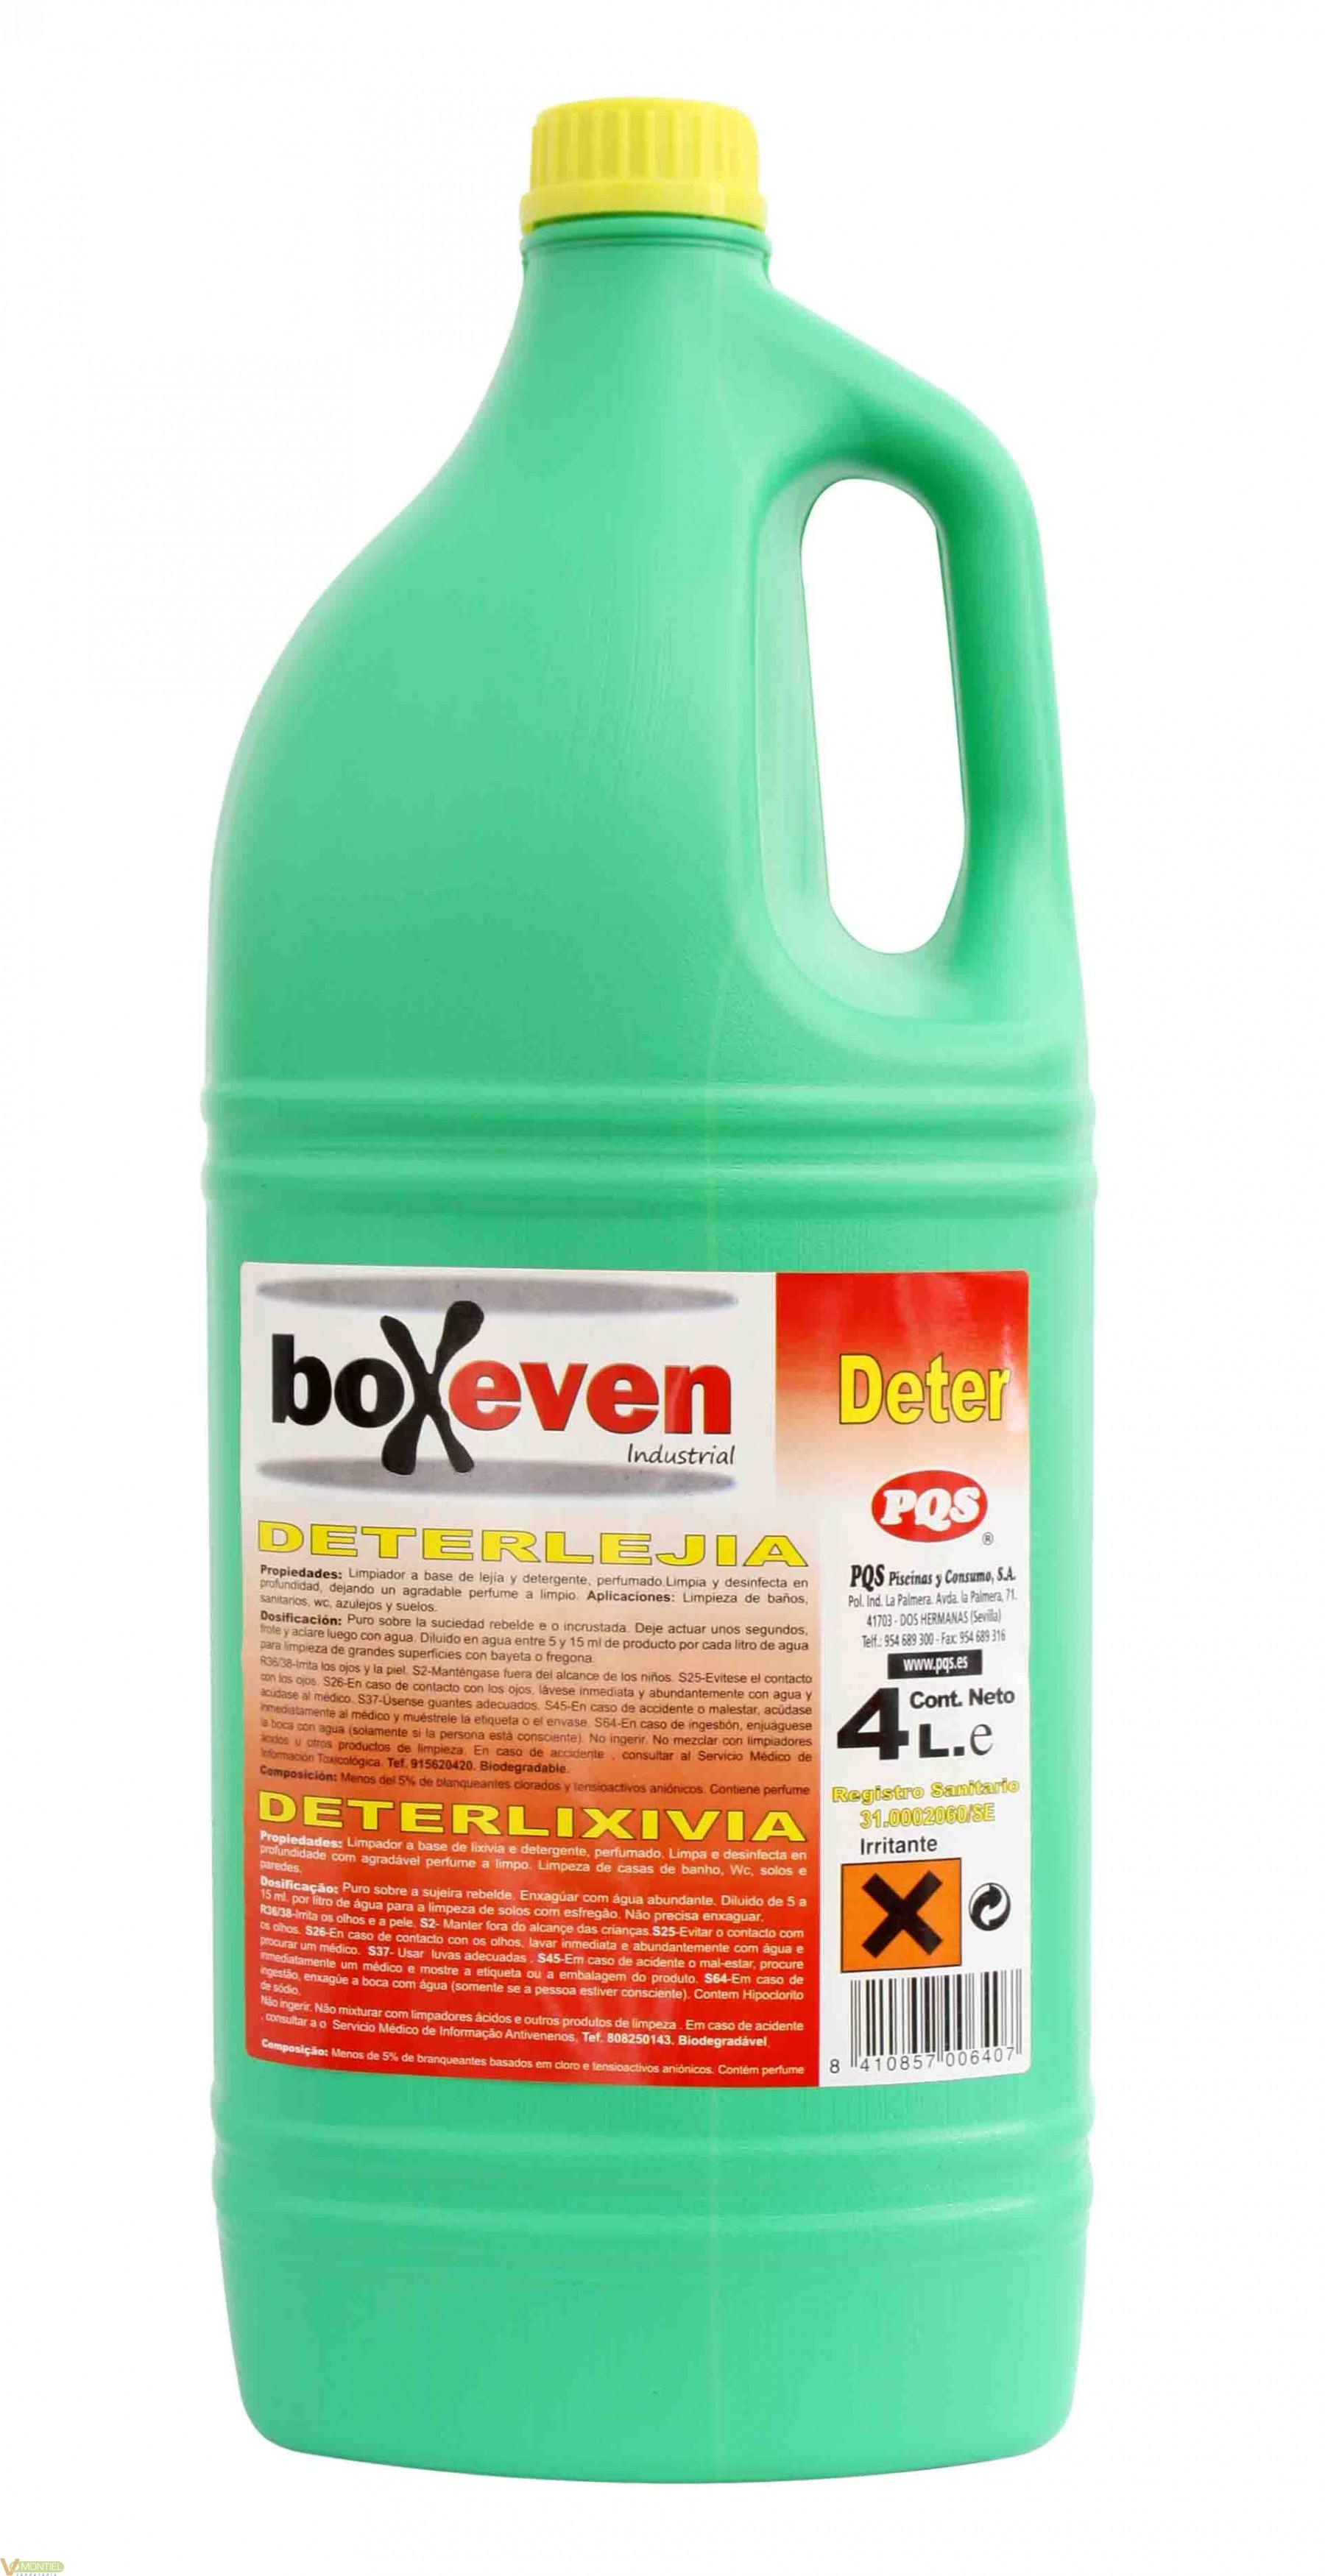 Lejia desinfeccion con deterge-0